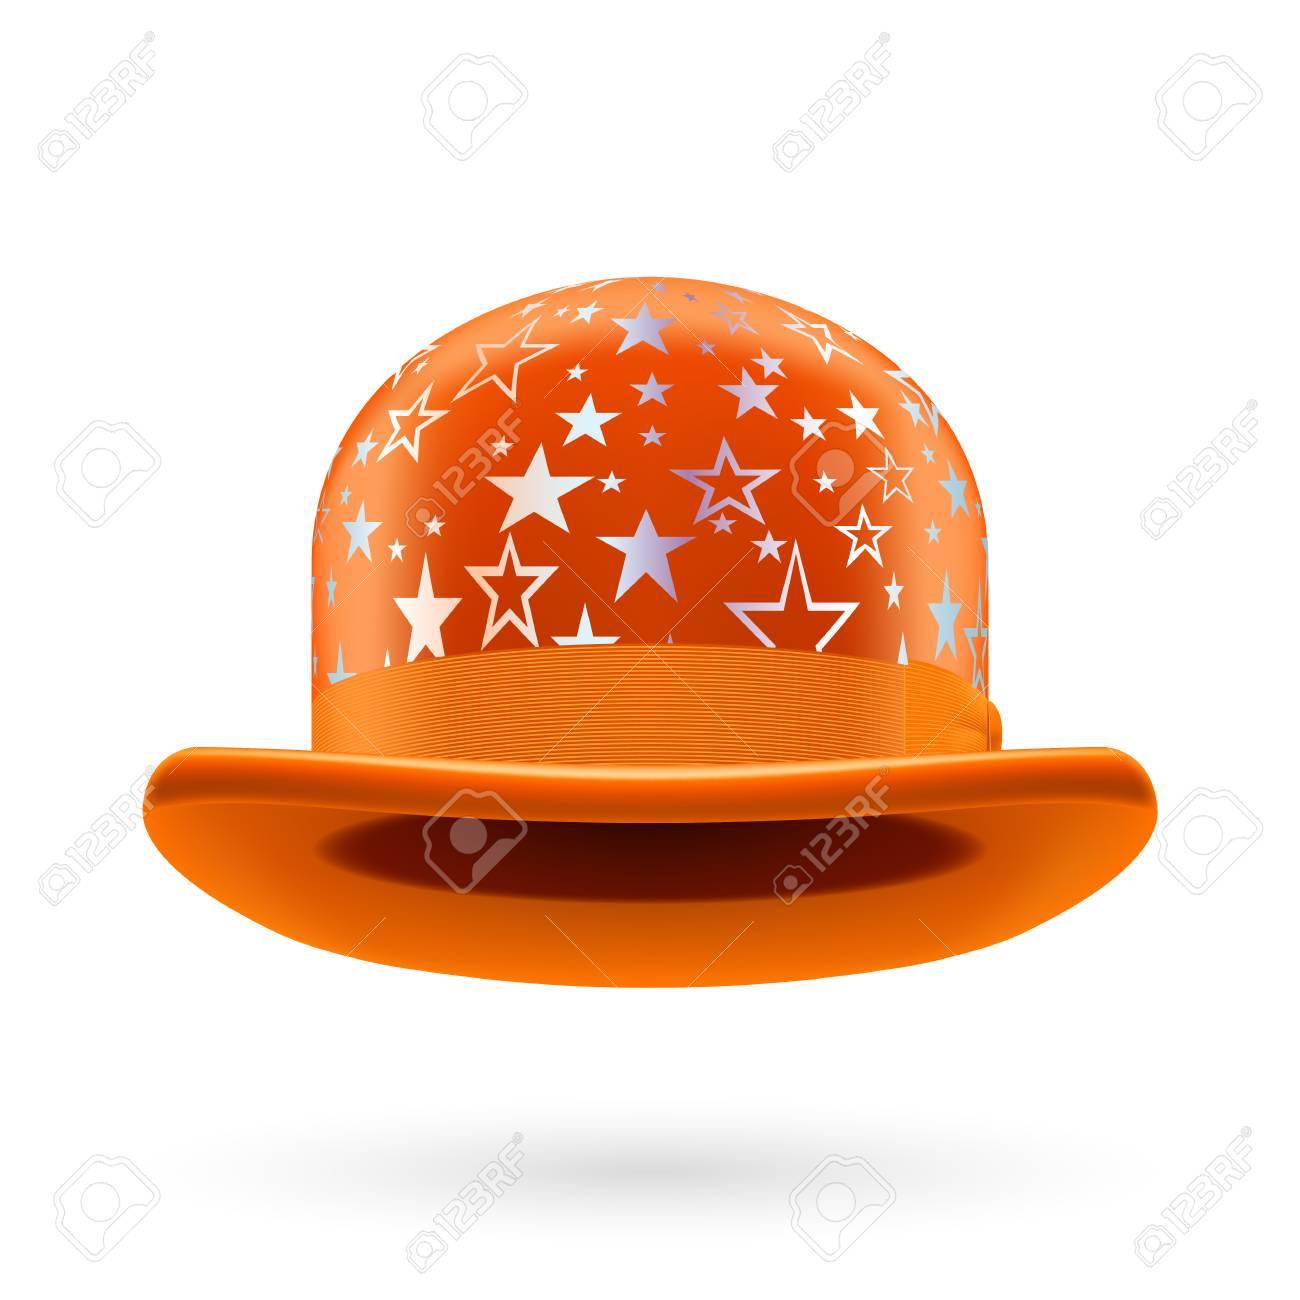 Orange round bowler hat with silver glistening stars. Stock Vector -  29032014 f4cff5c1e8c